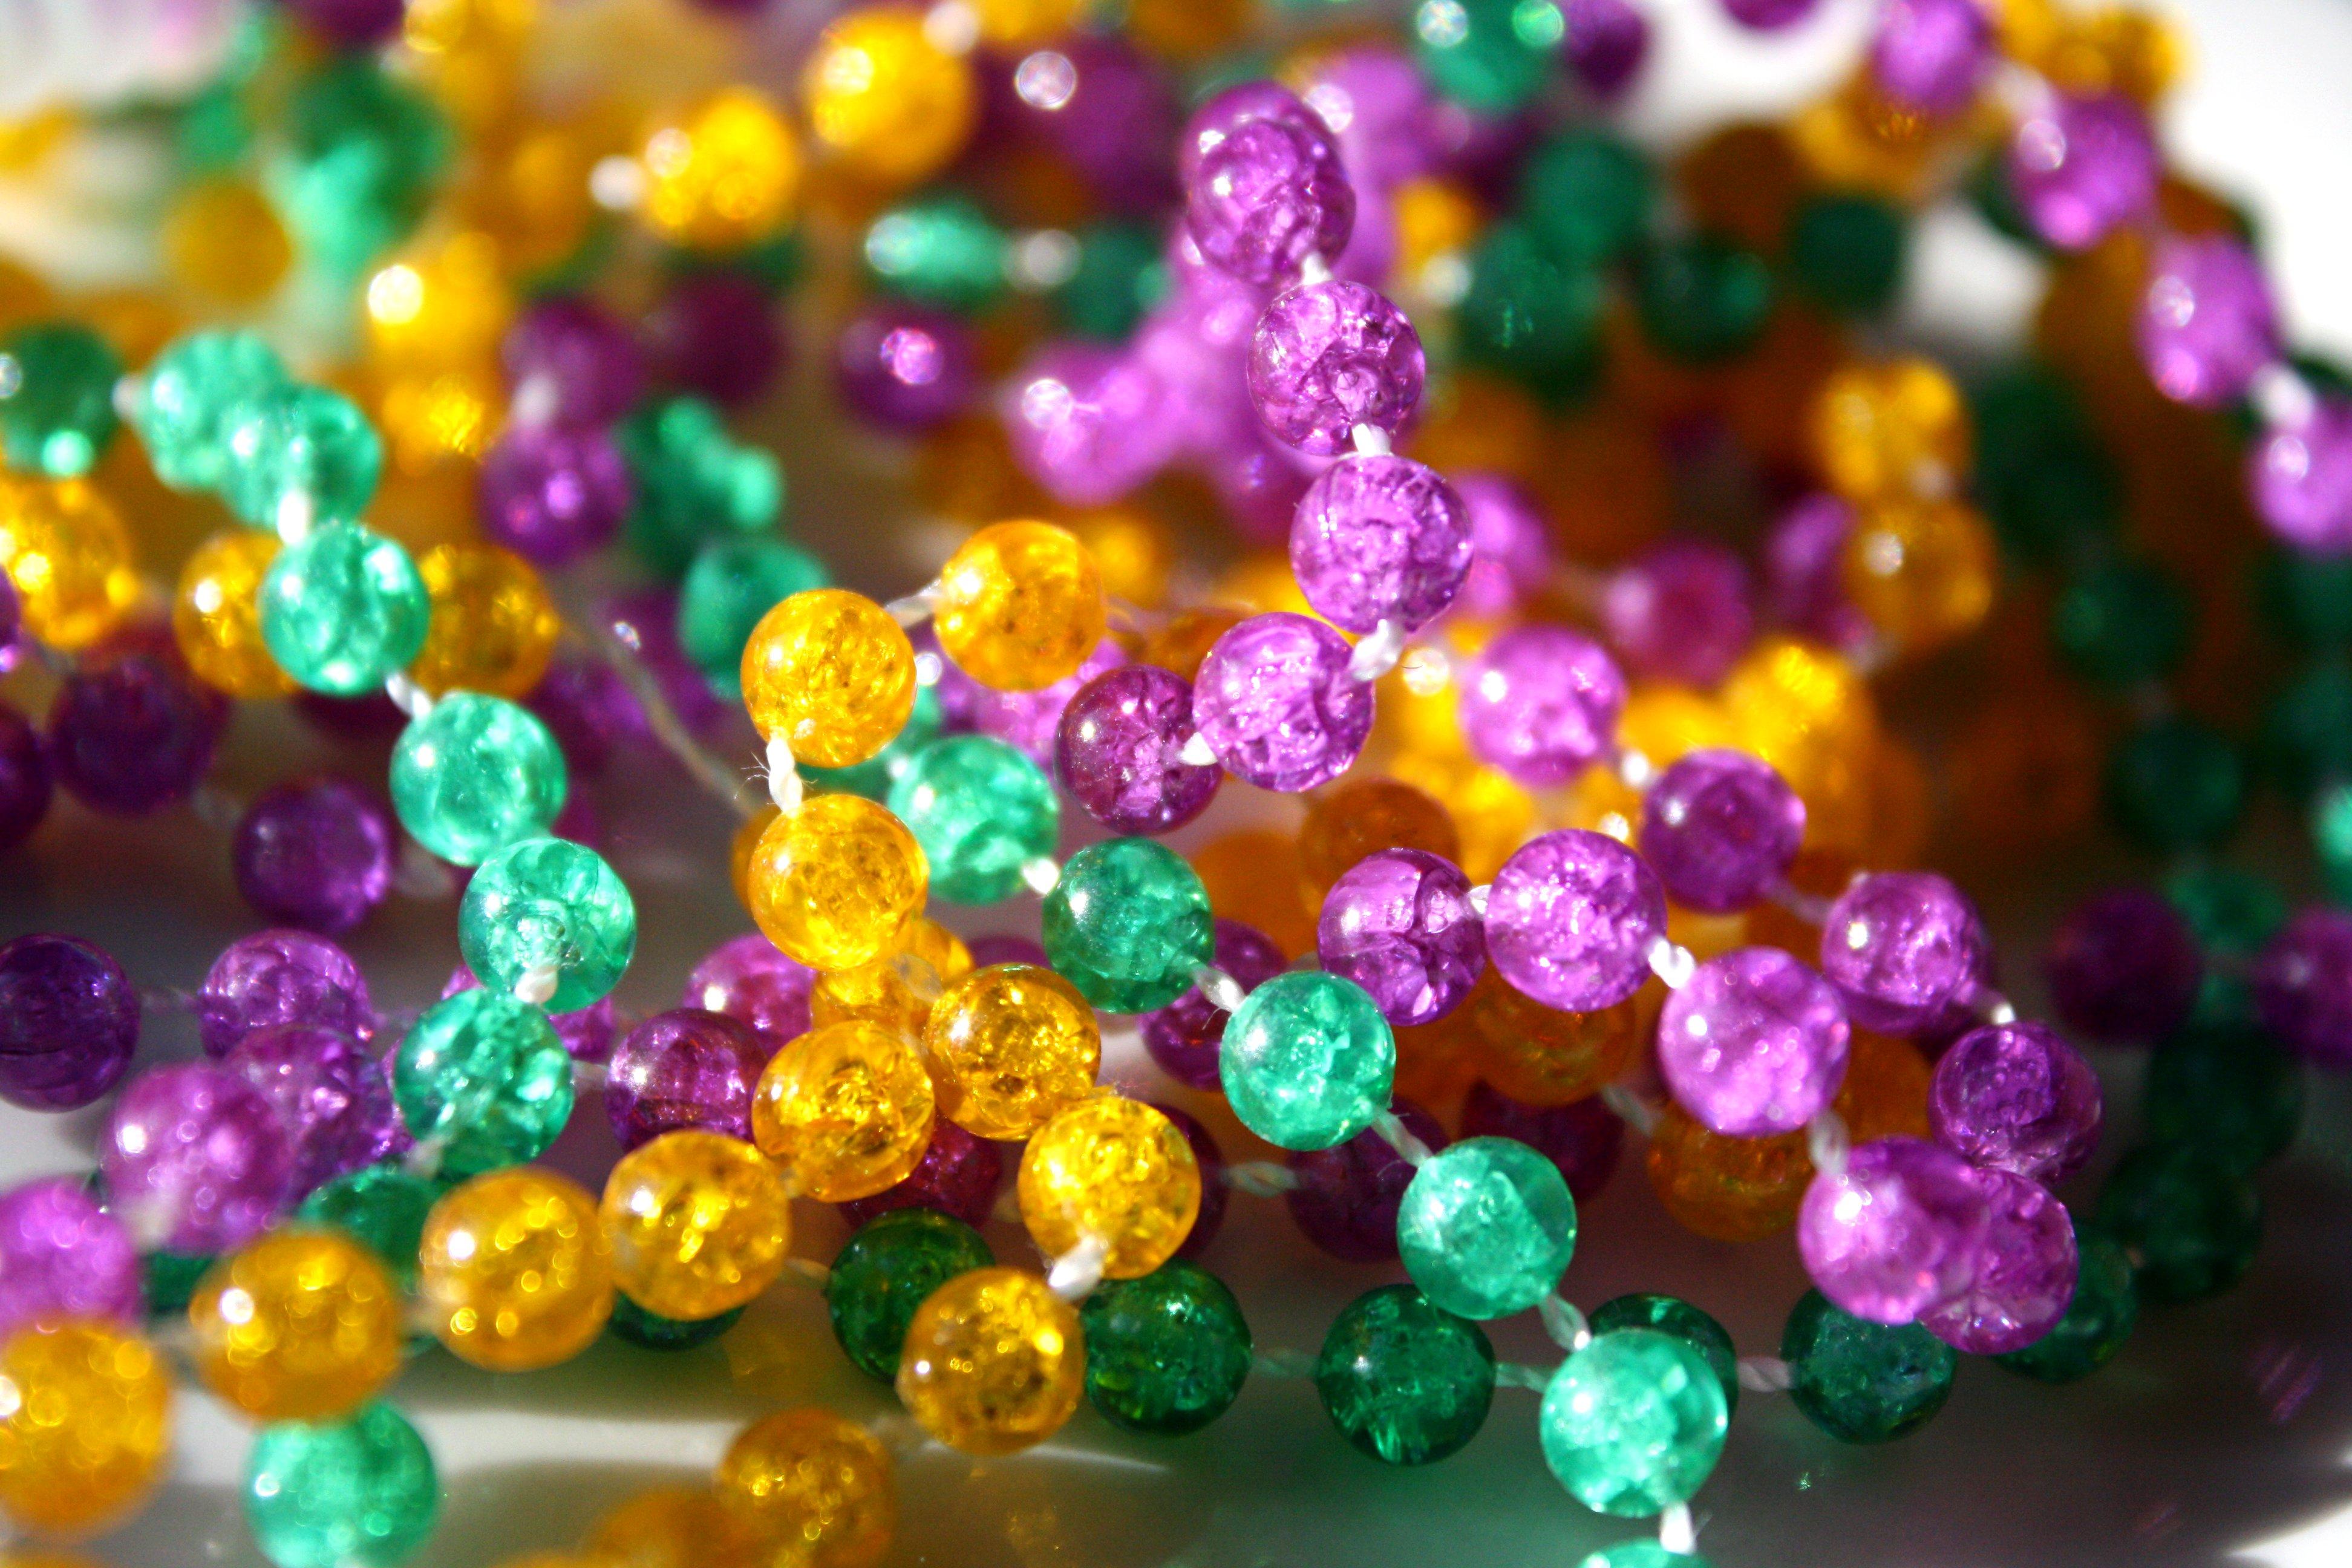 Mardi Gras Beads Closeup Picture Photograph Photos Public 3888x2592